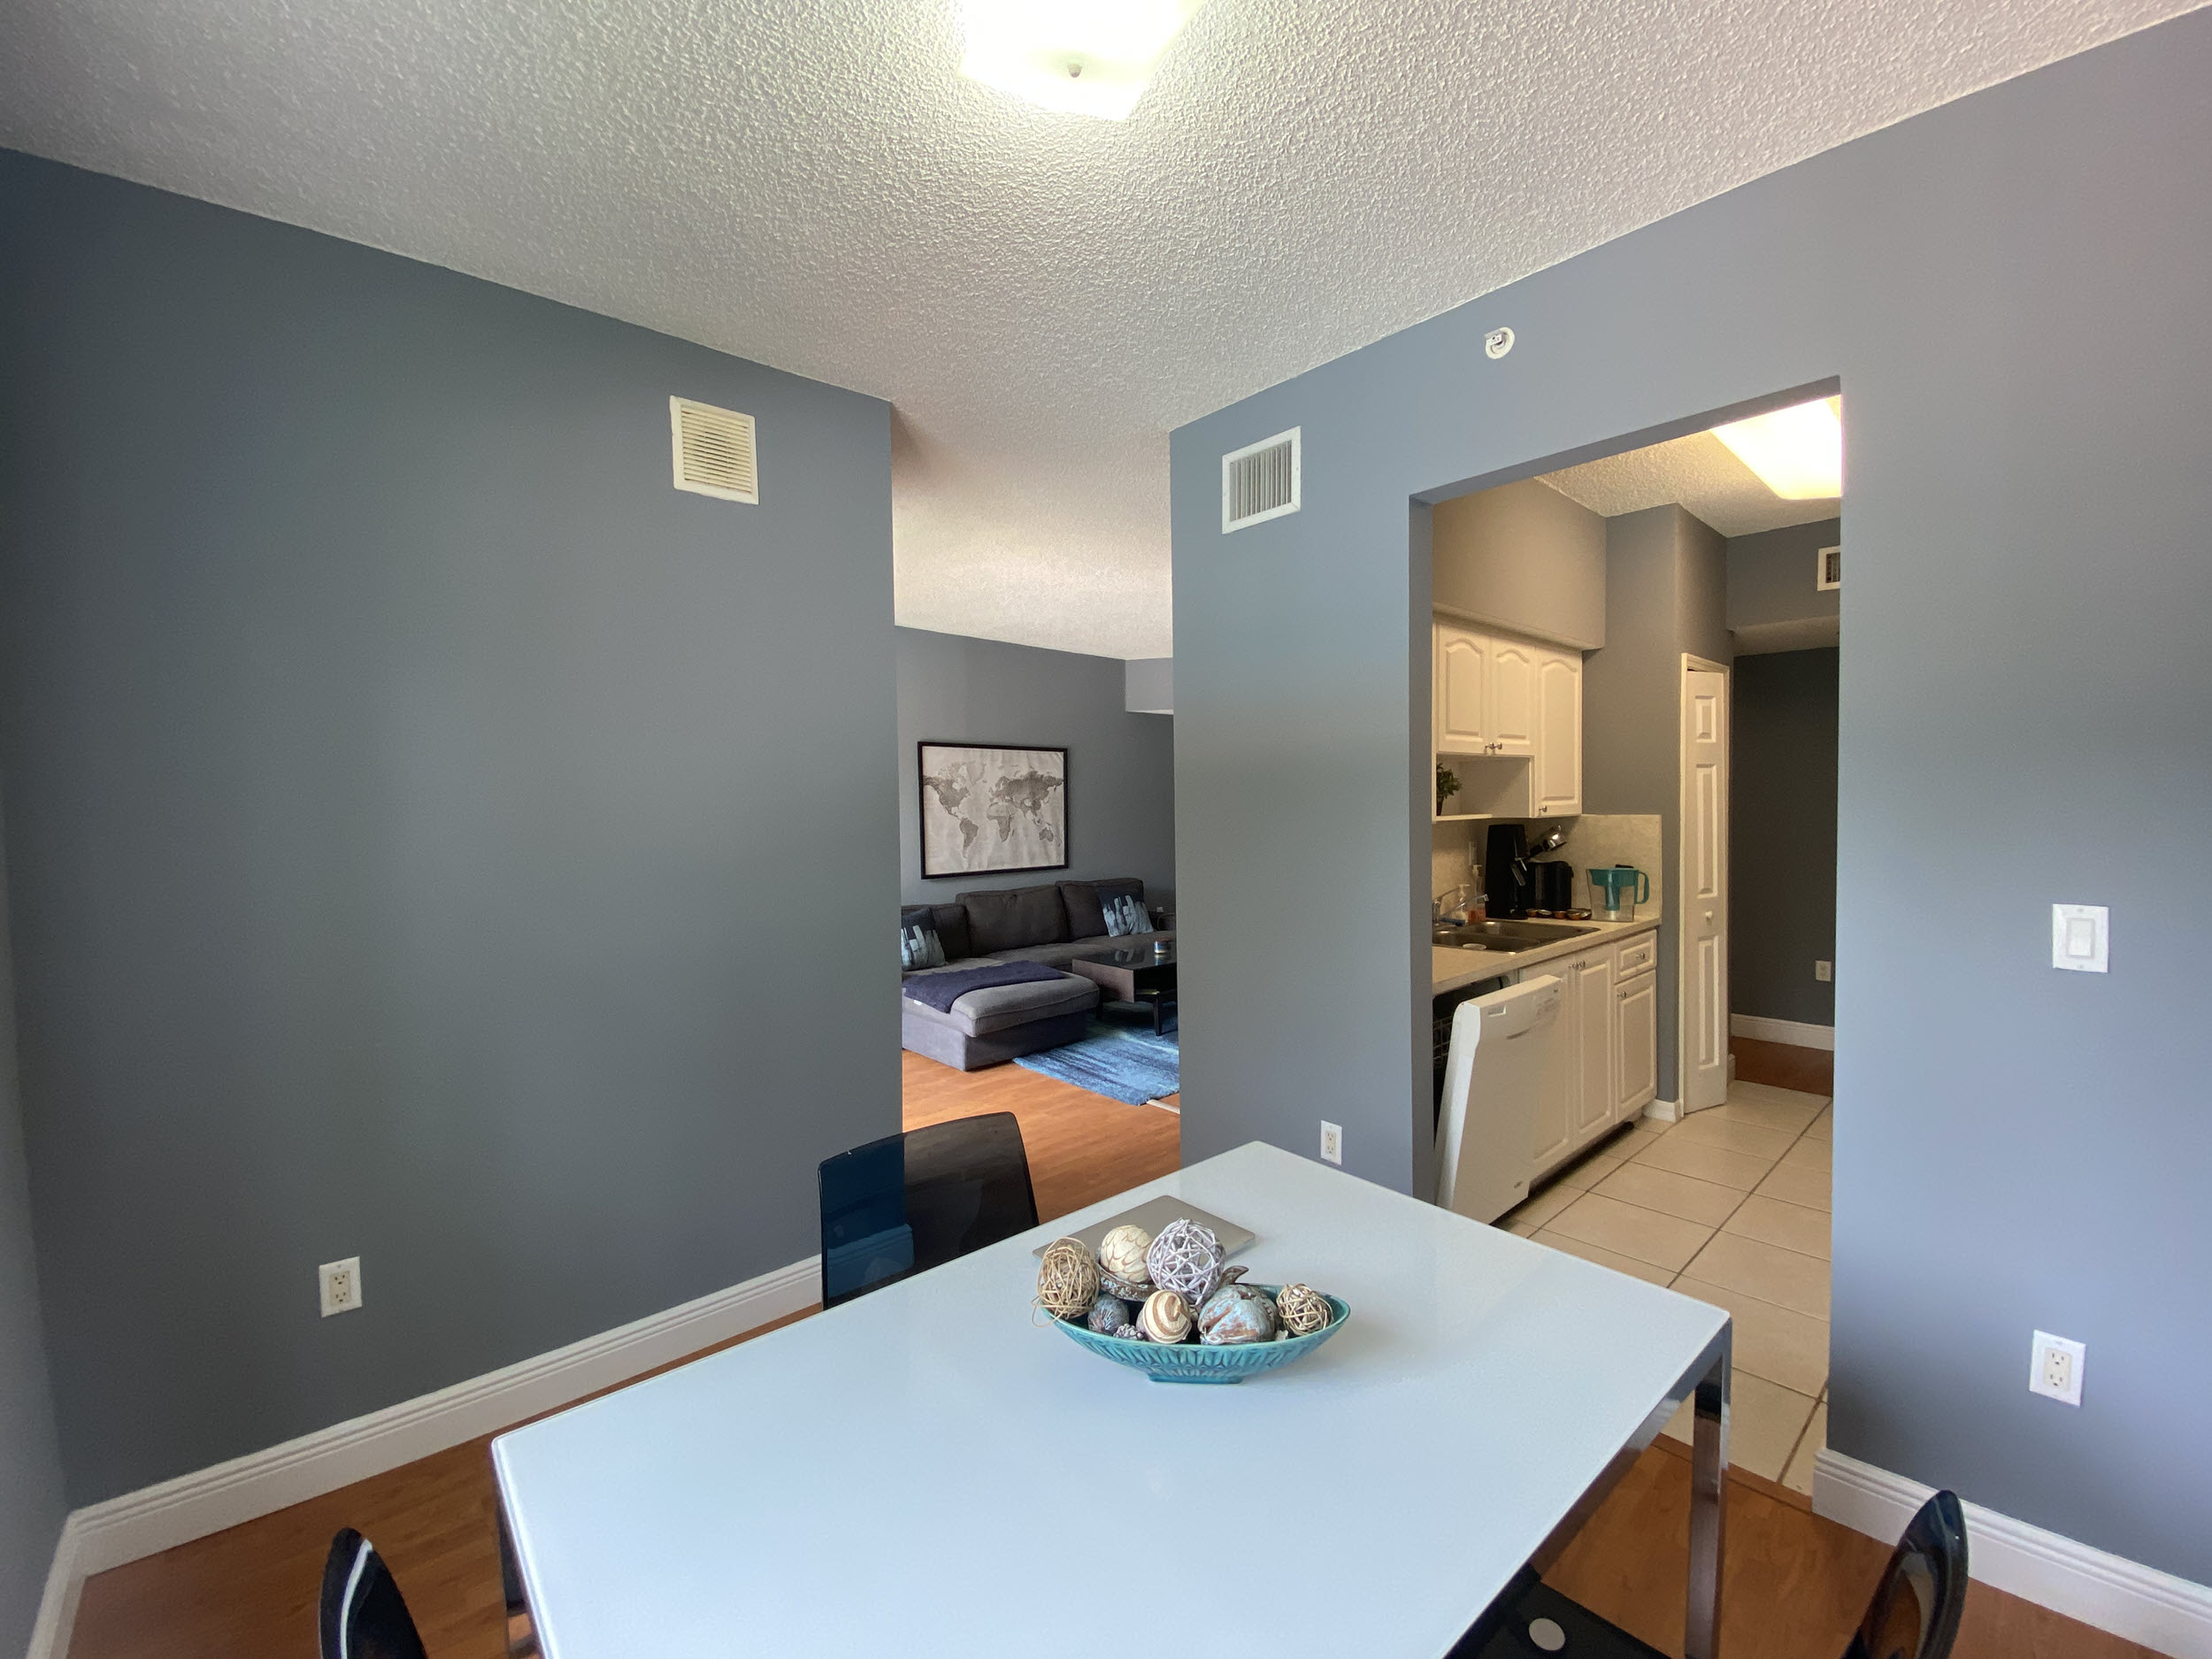 view of kitchen – living room unit 220 university parc residence condominium davie fl